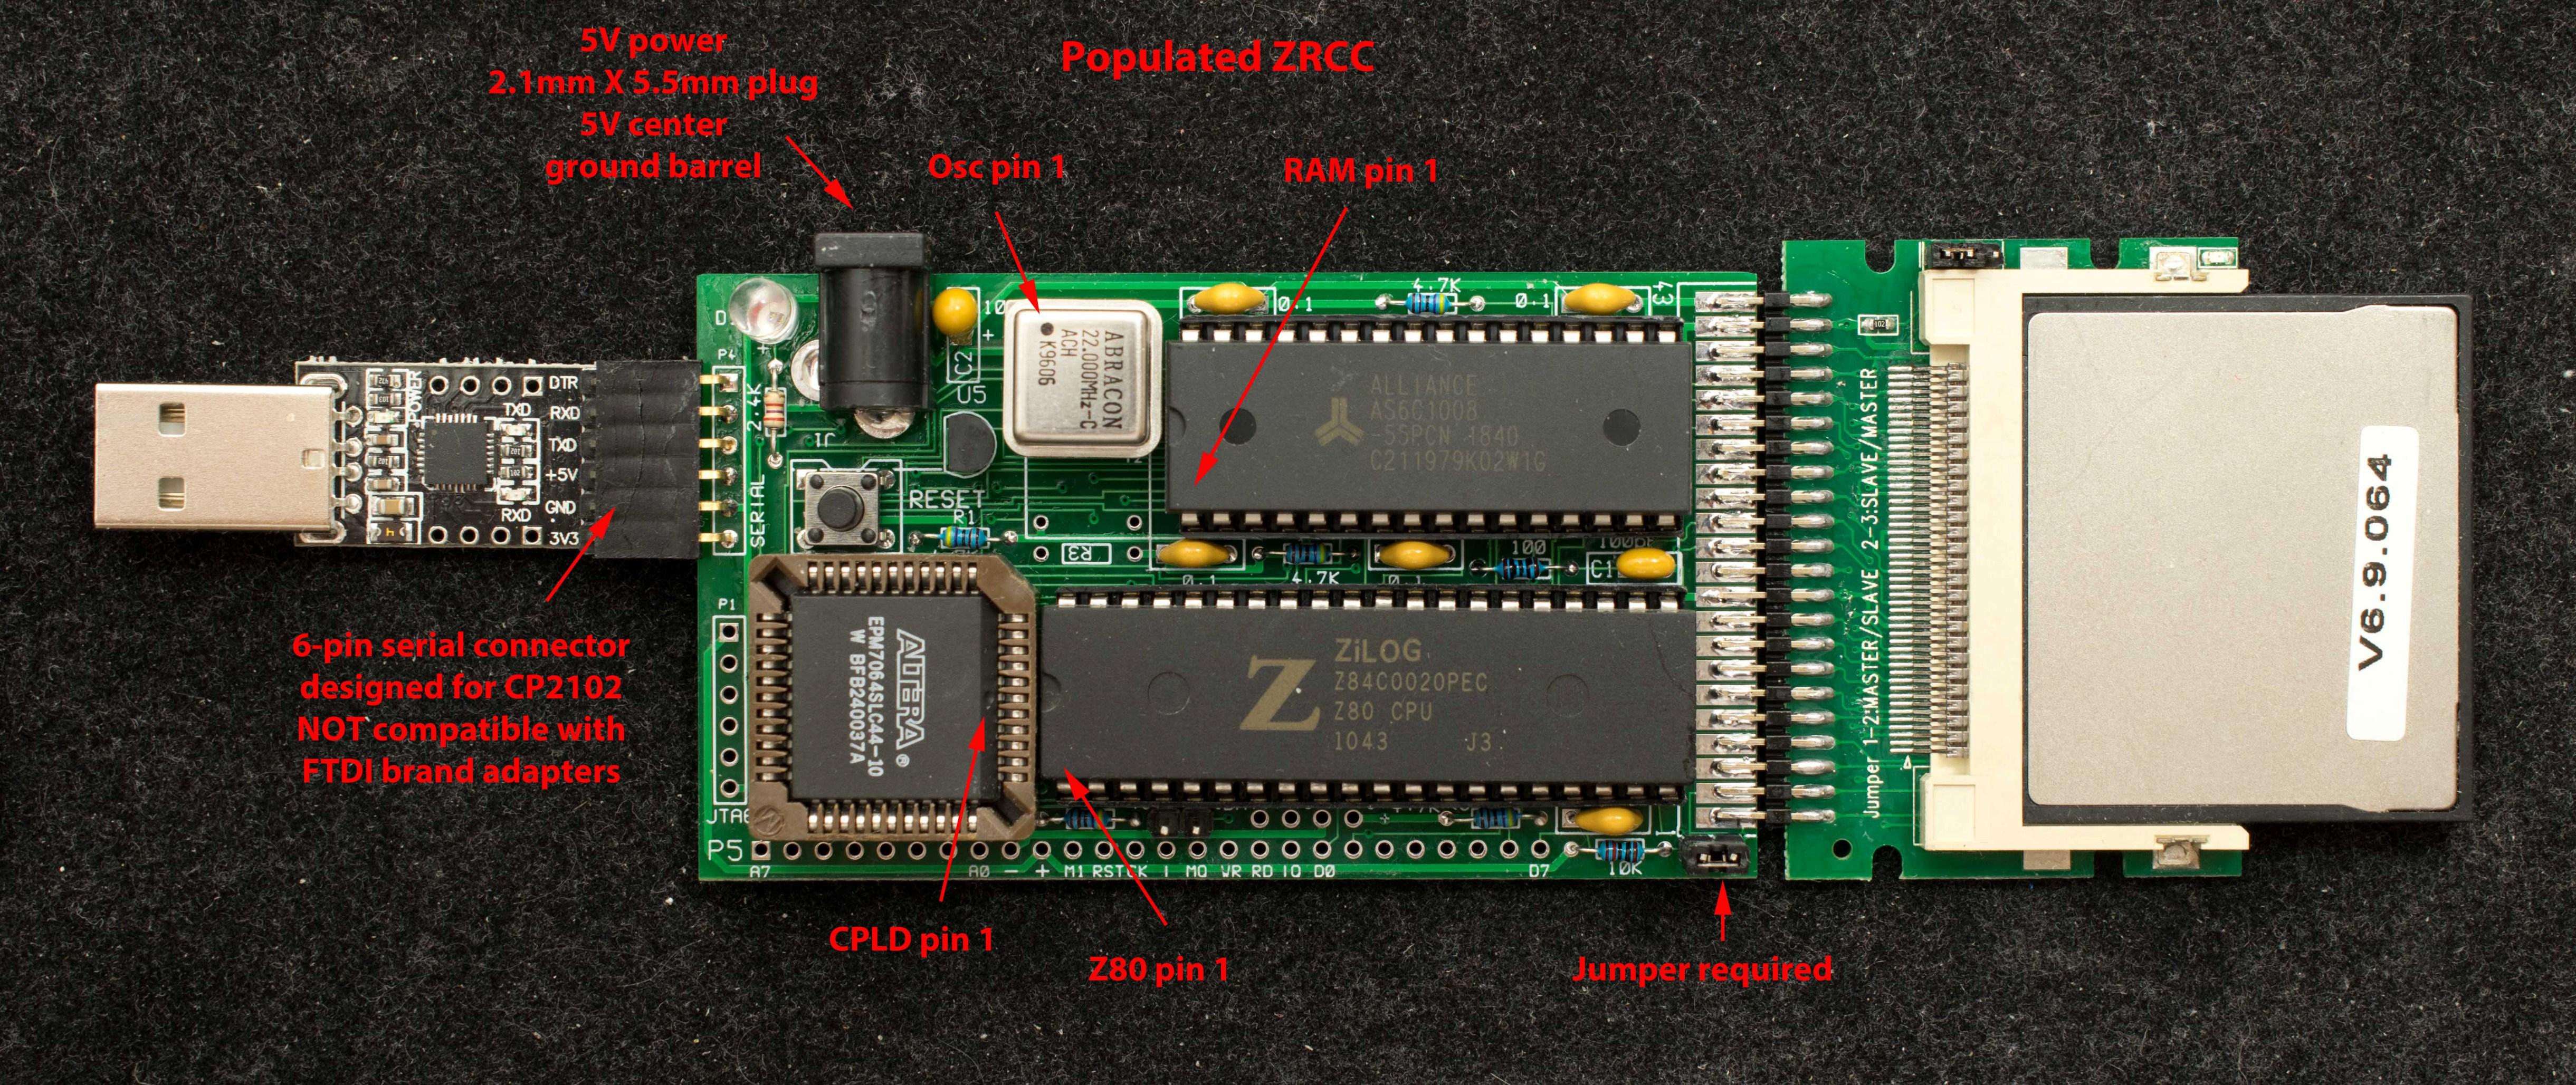 www.retrobrewcomputers.org_lib_plugins_ckgedit_fckeditor_userfiles_image_builderpages_plasmo_zrcc_zrcc1_zrcc_rev1_1_populated.jpg